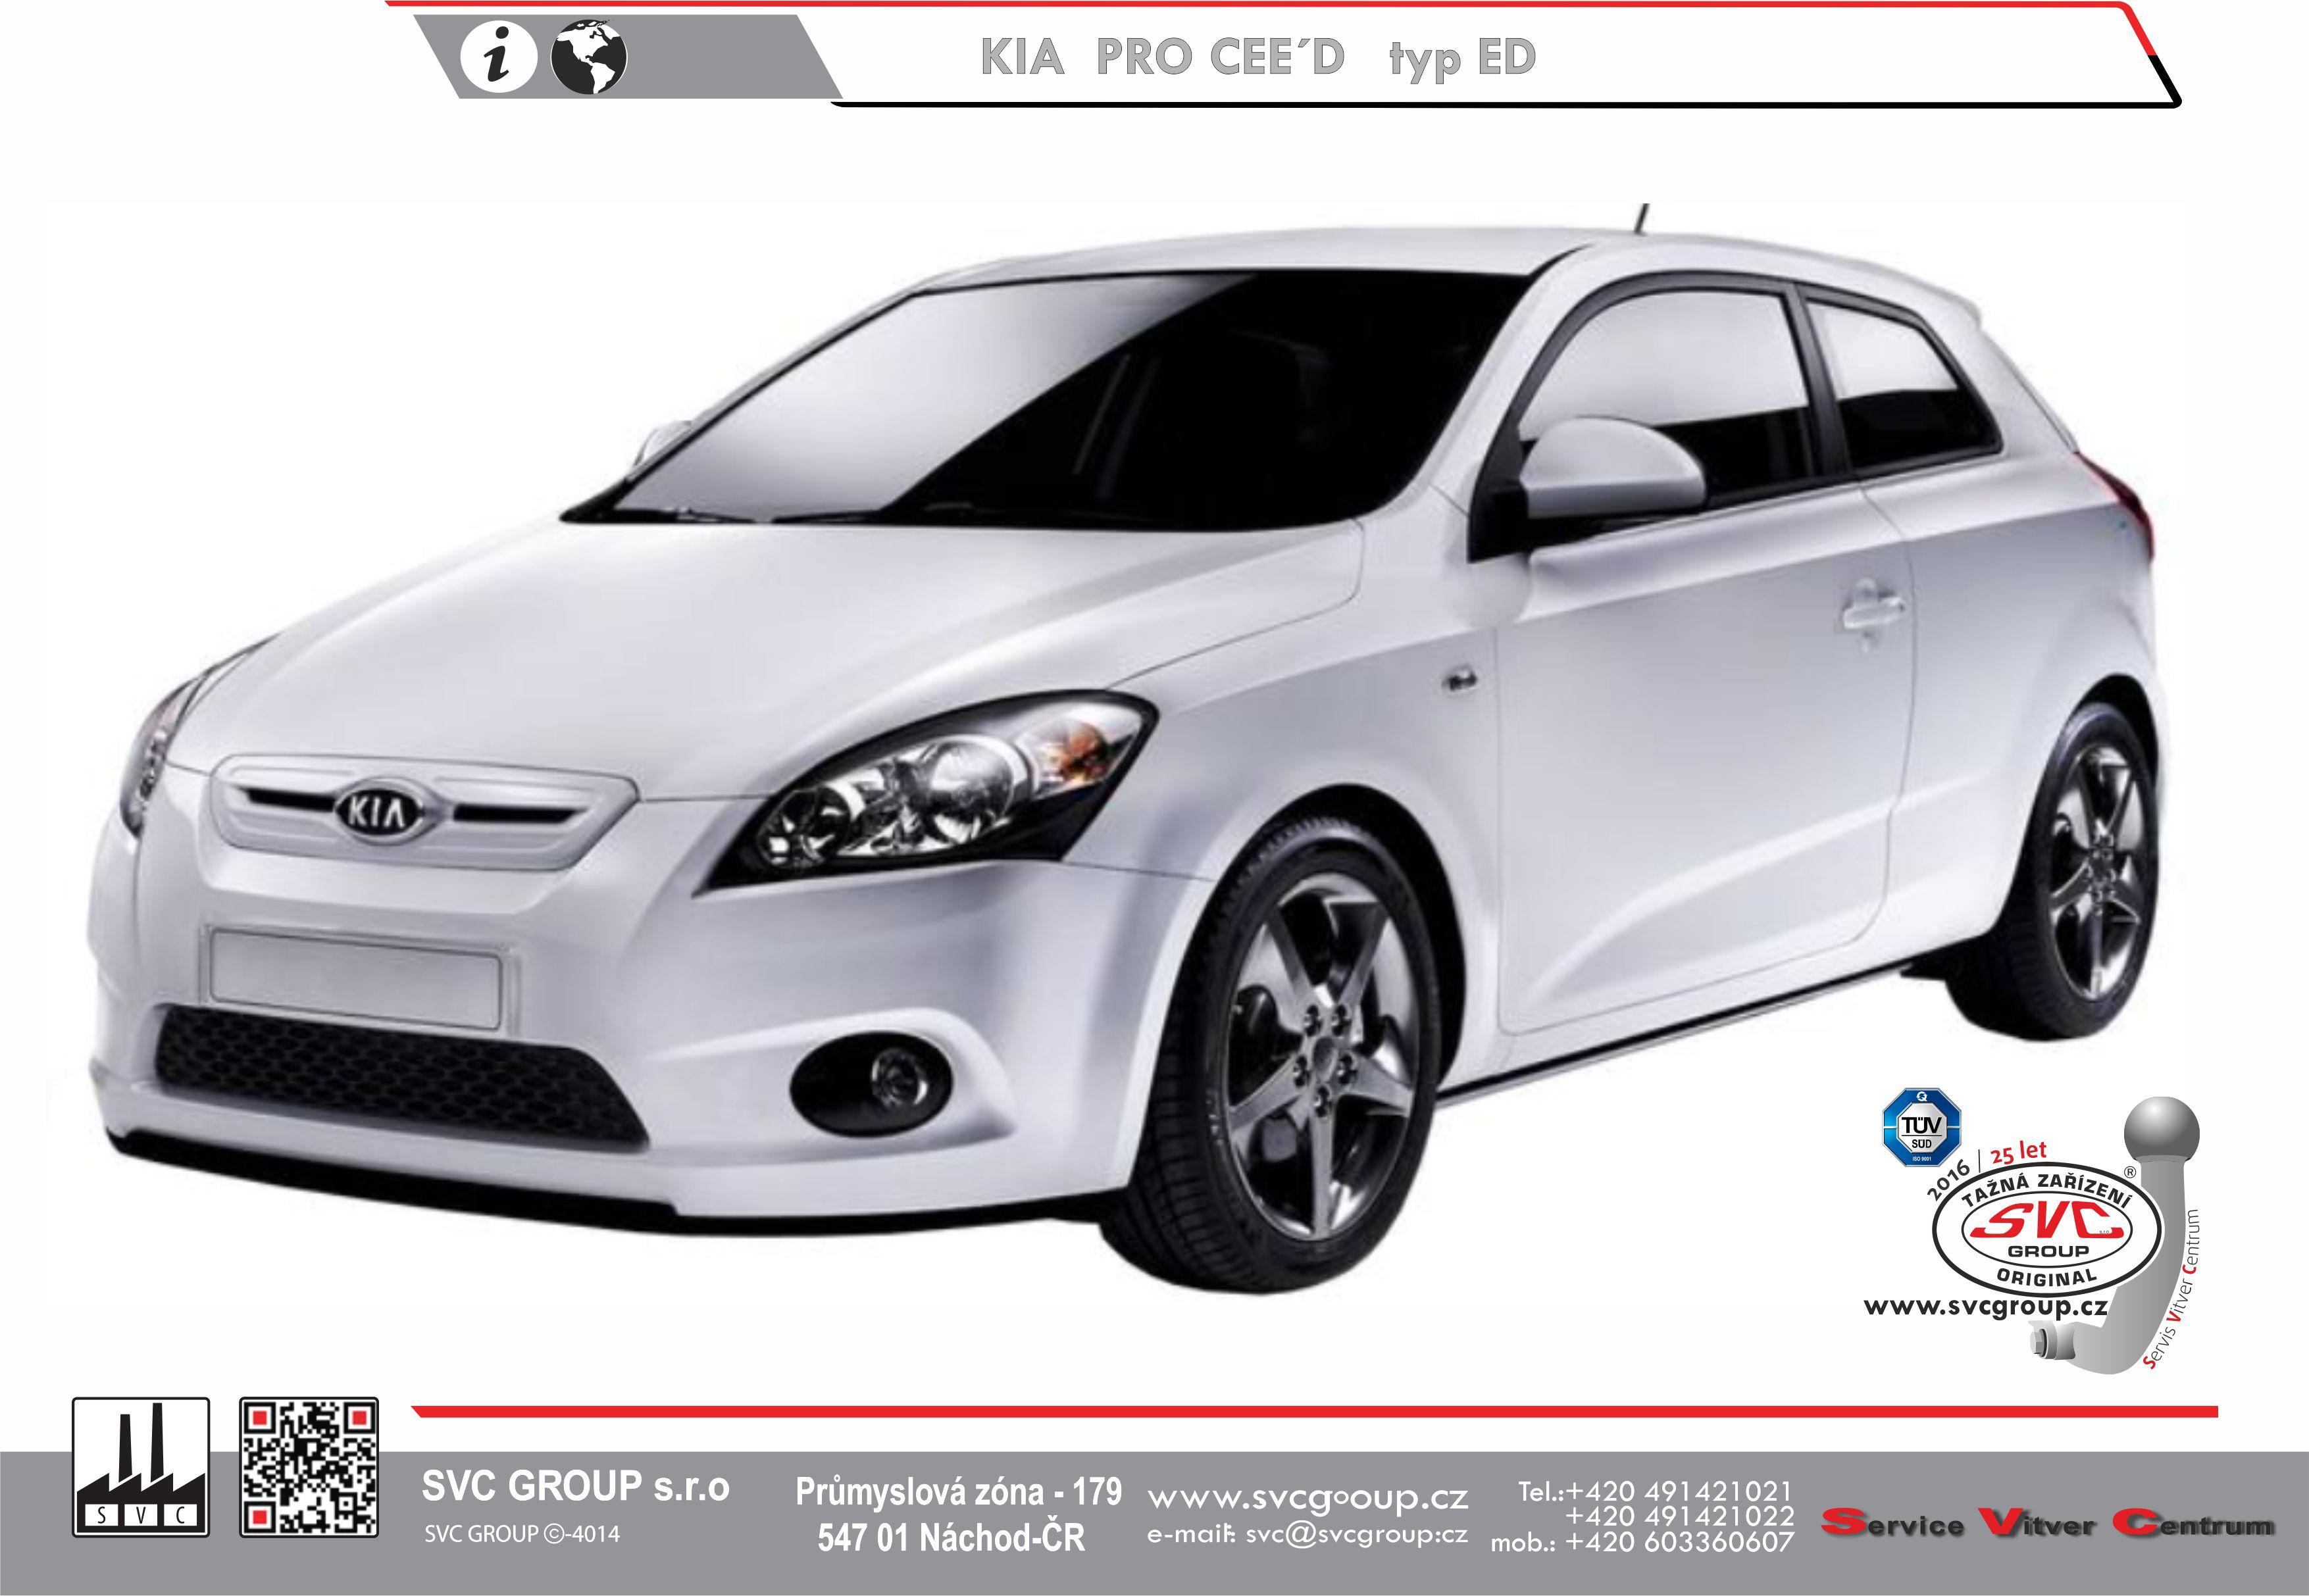 Kia Pro Ceed